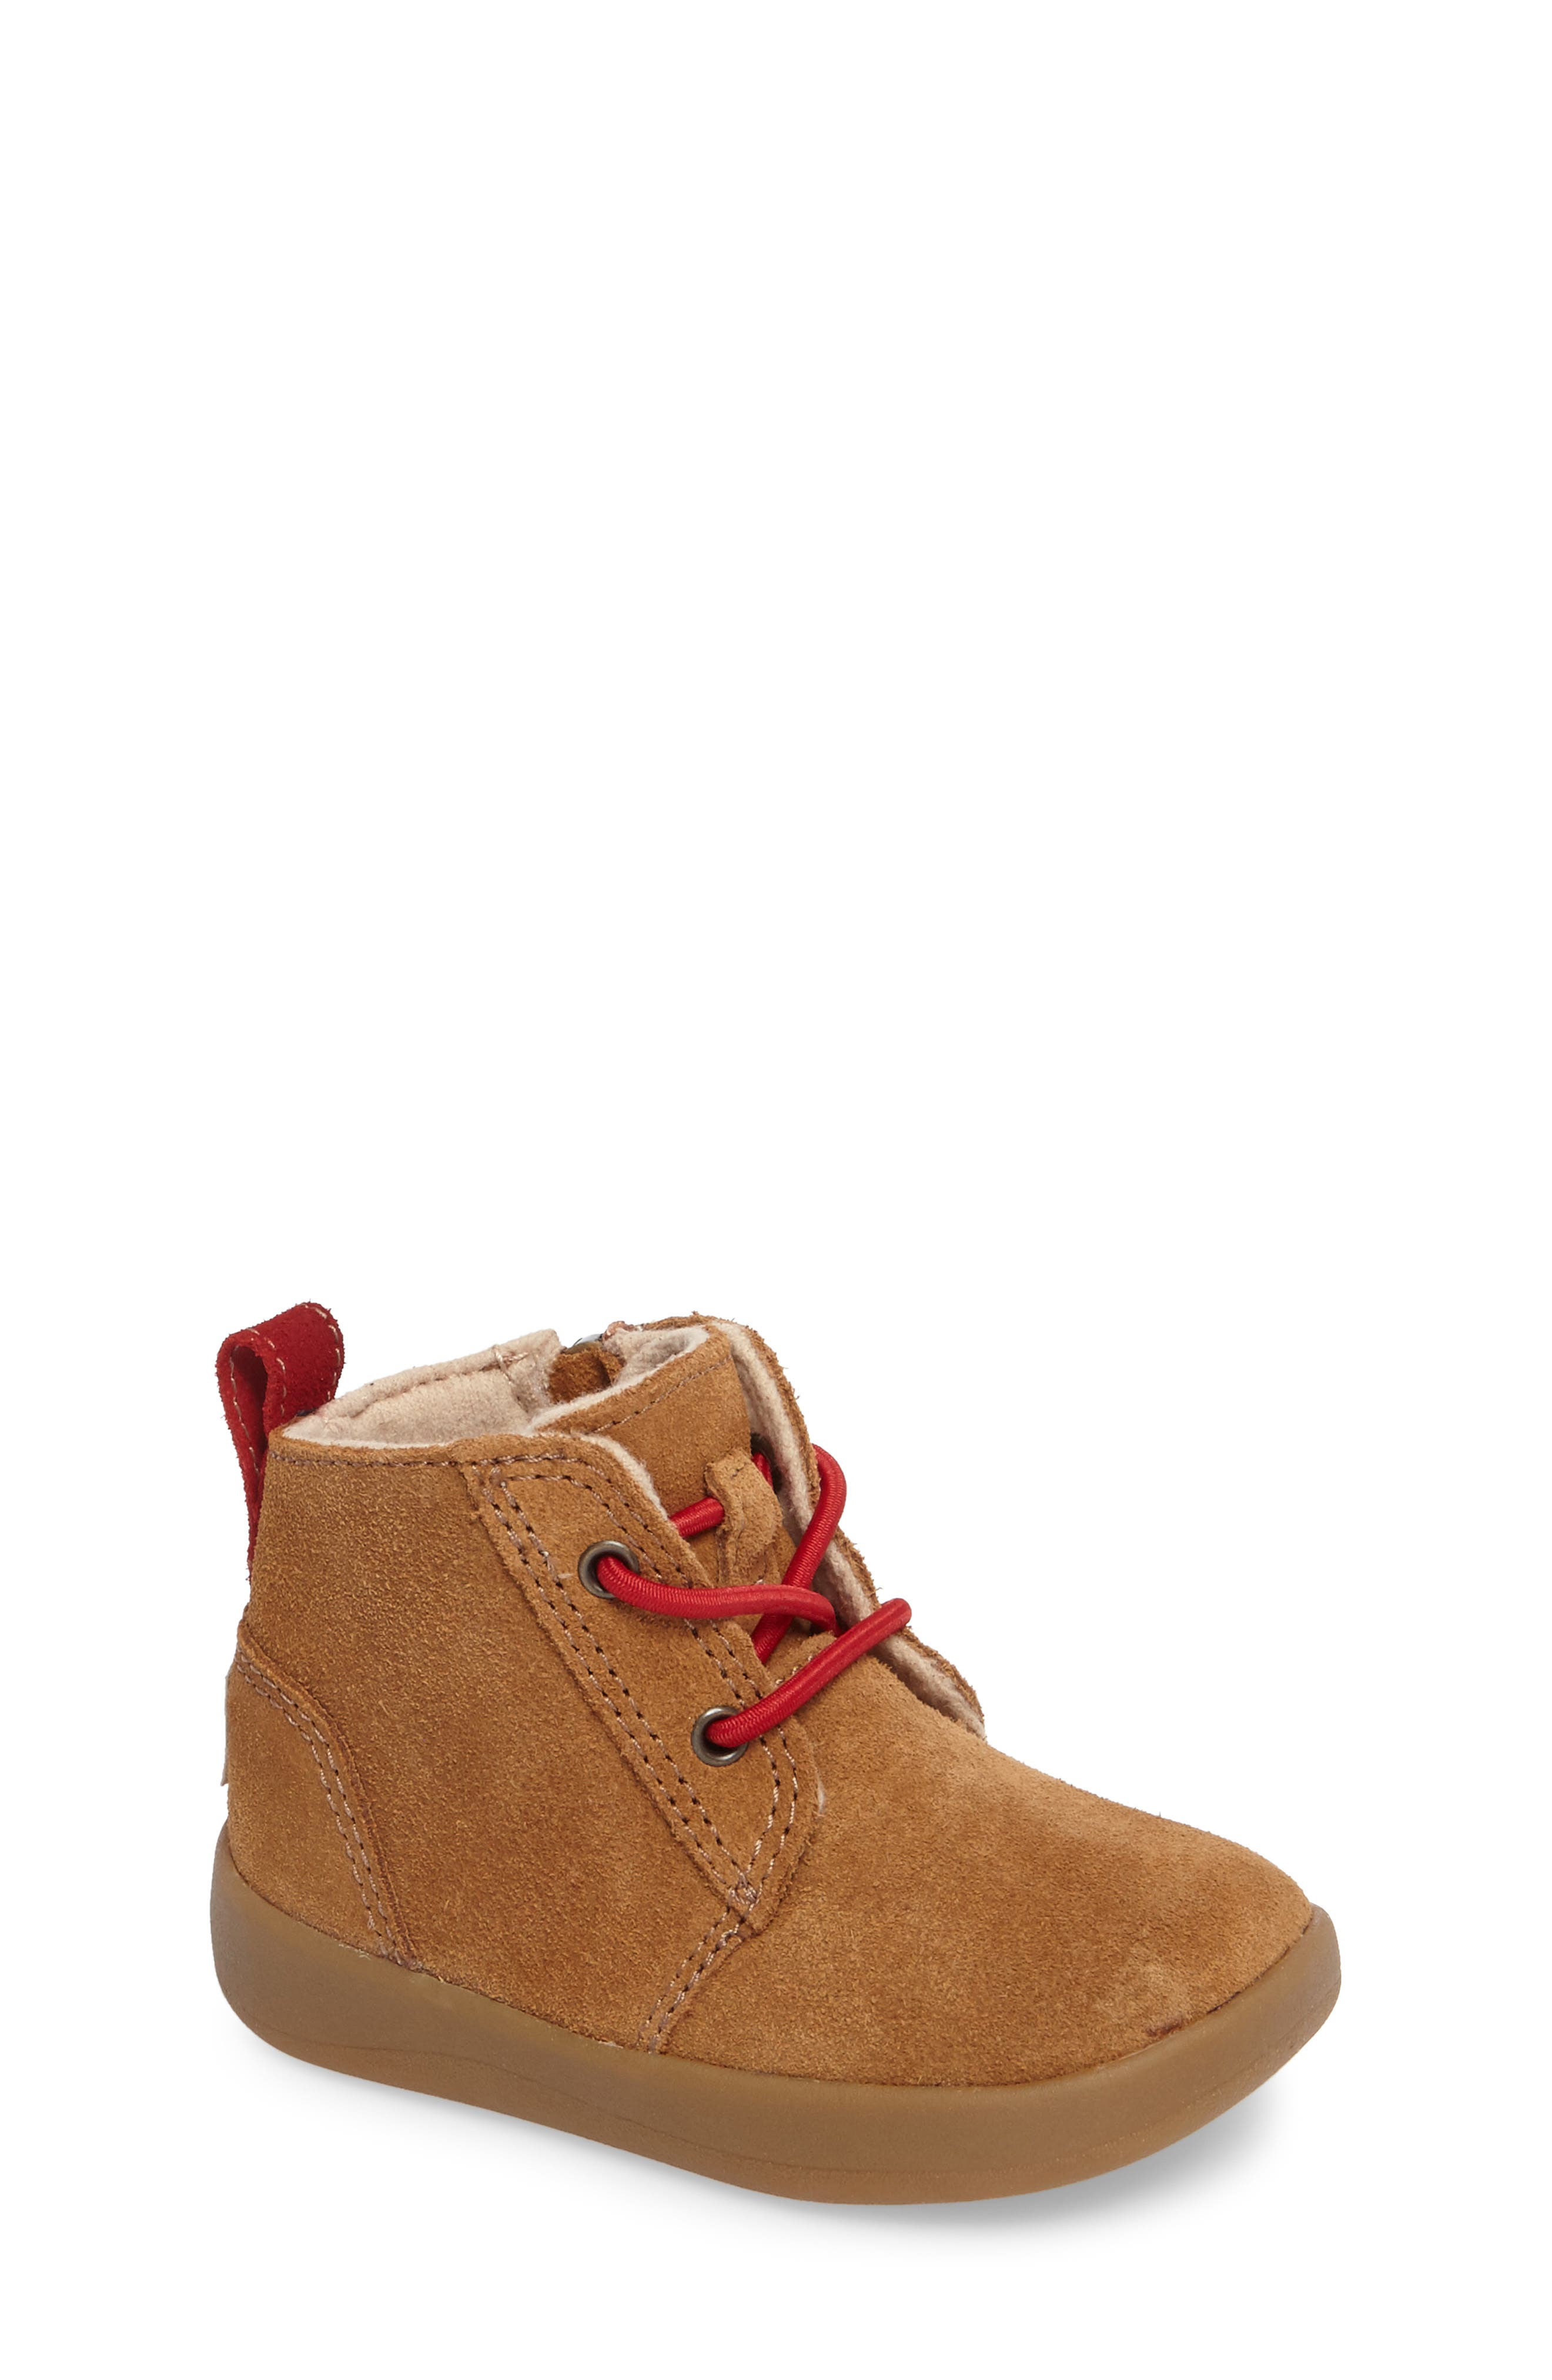 Alternate Image 1 Selected - UGG® Kristjan Chukka Bootie Sneaker (Baby & Walker)